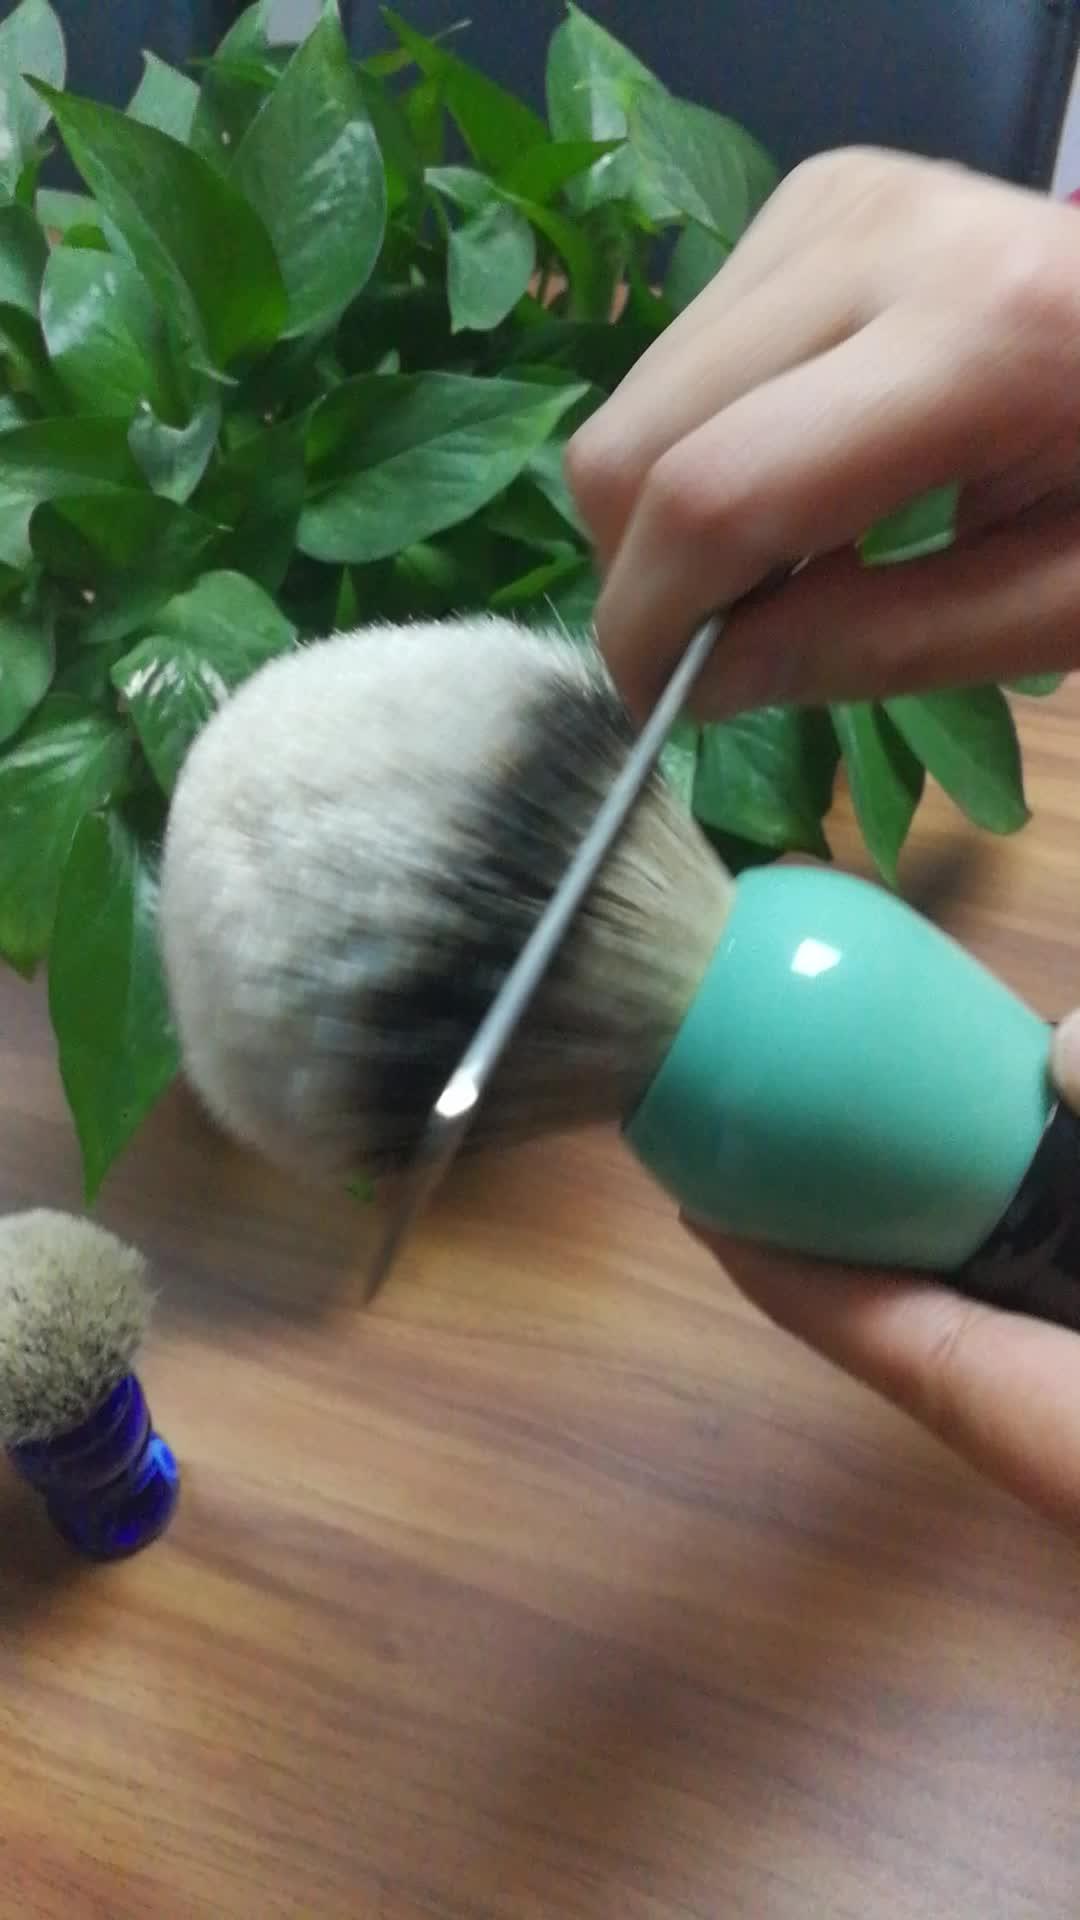 Silvertip Badger Hair Shaving Brush with Resin Handle